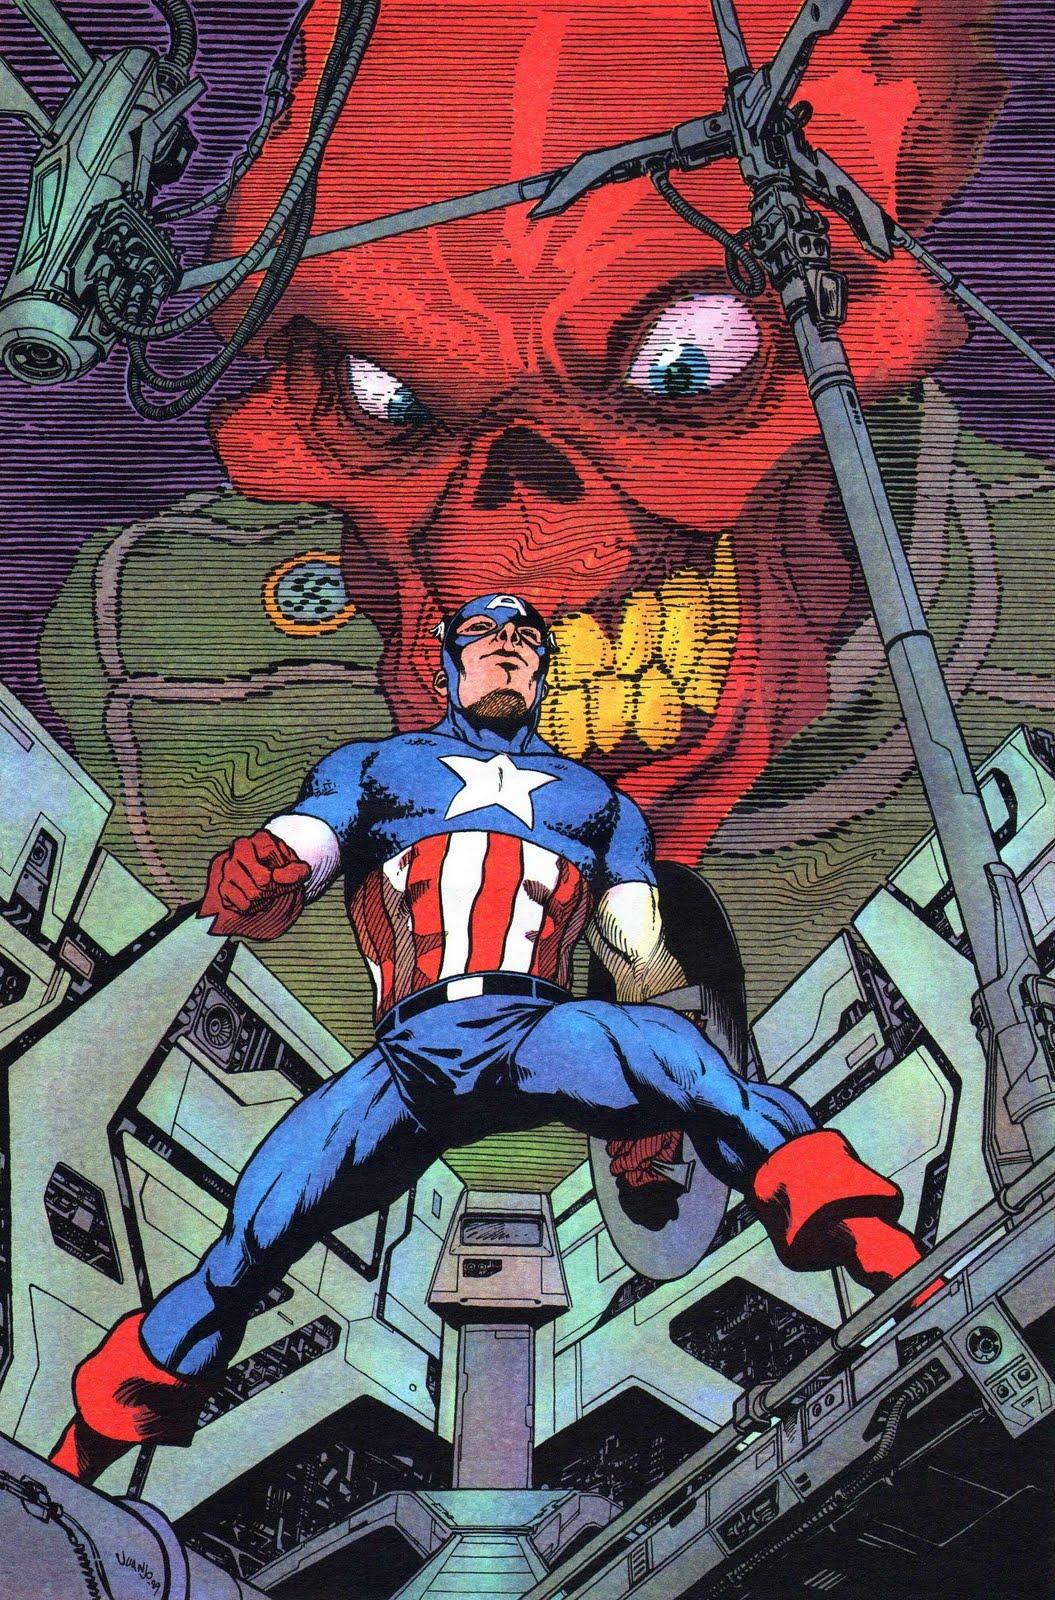 Captain America vs Red Skull